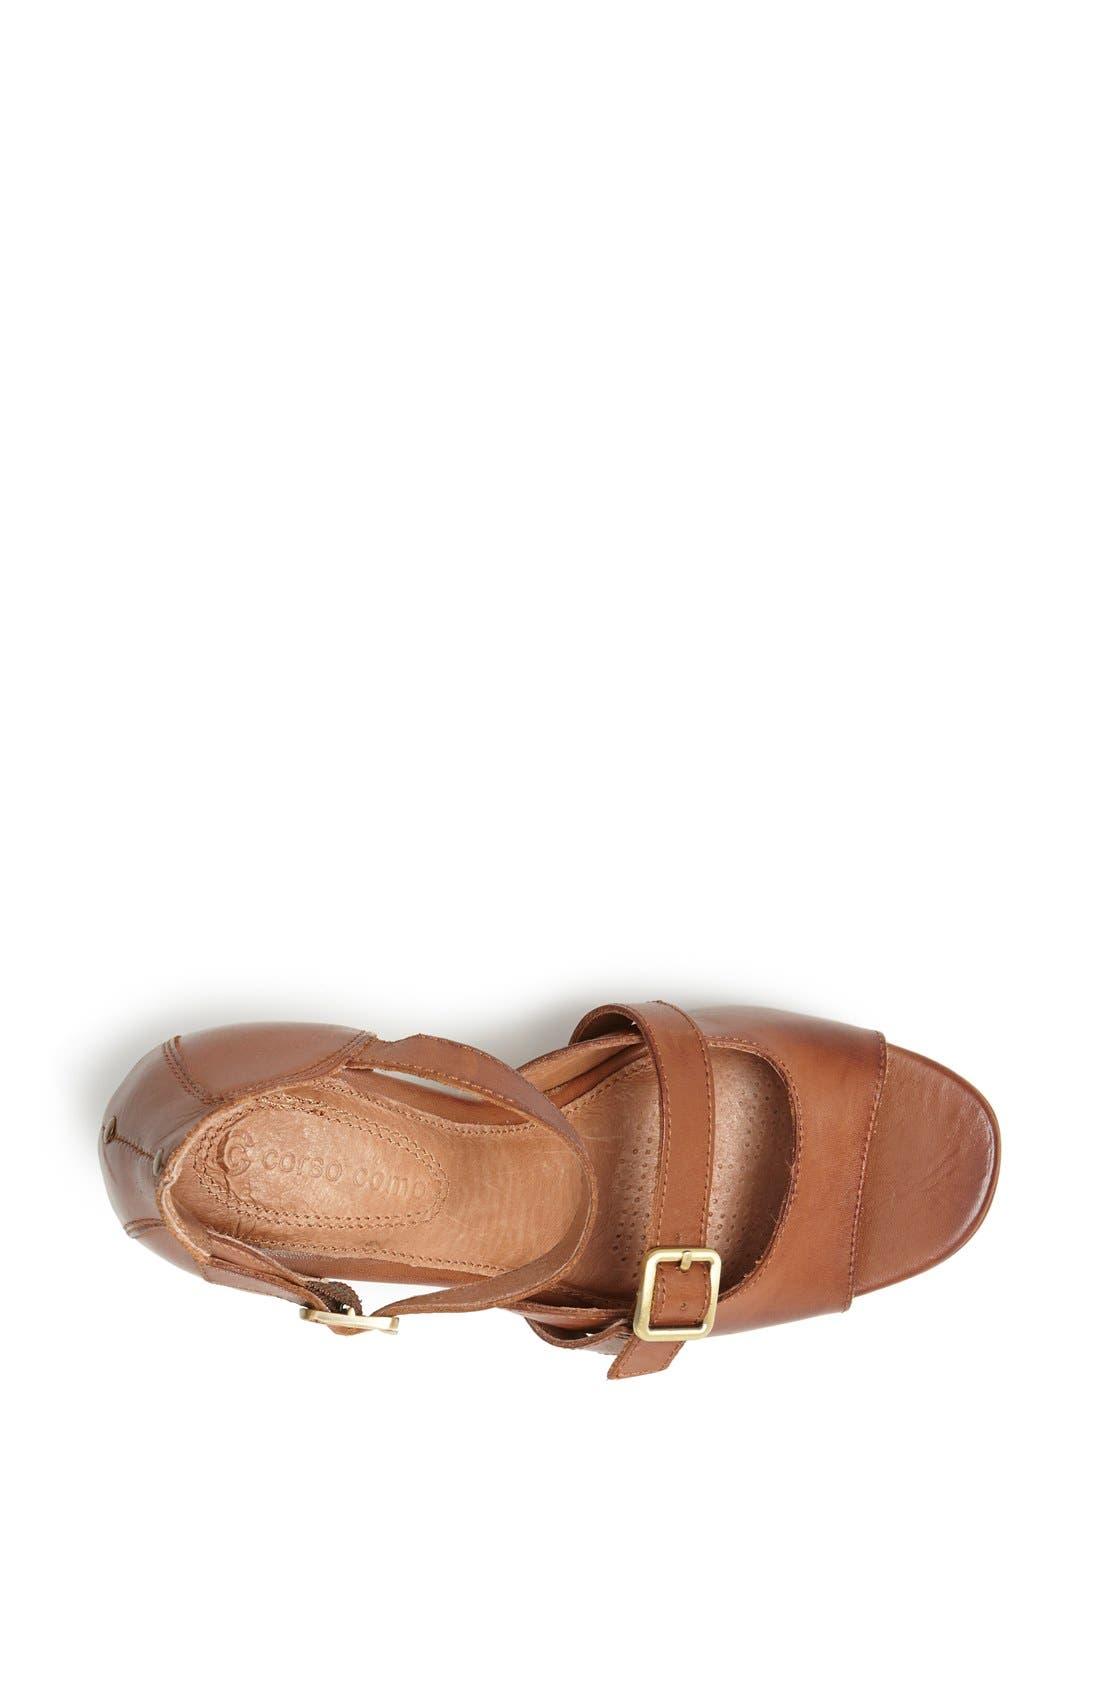 Alternate Image 3  - Corso Como 'Hello' Calfskin Leather Sandal